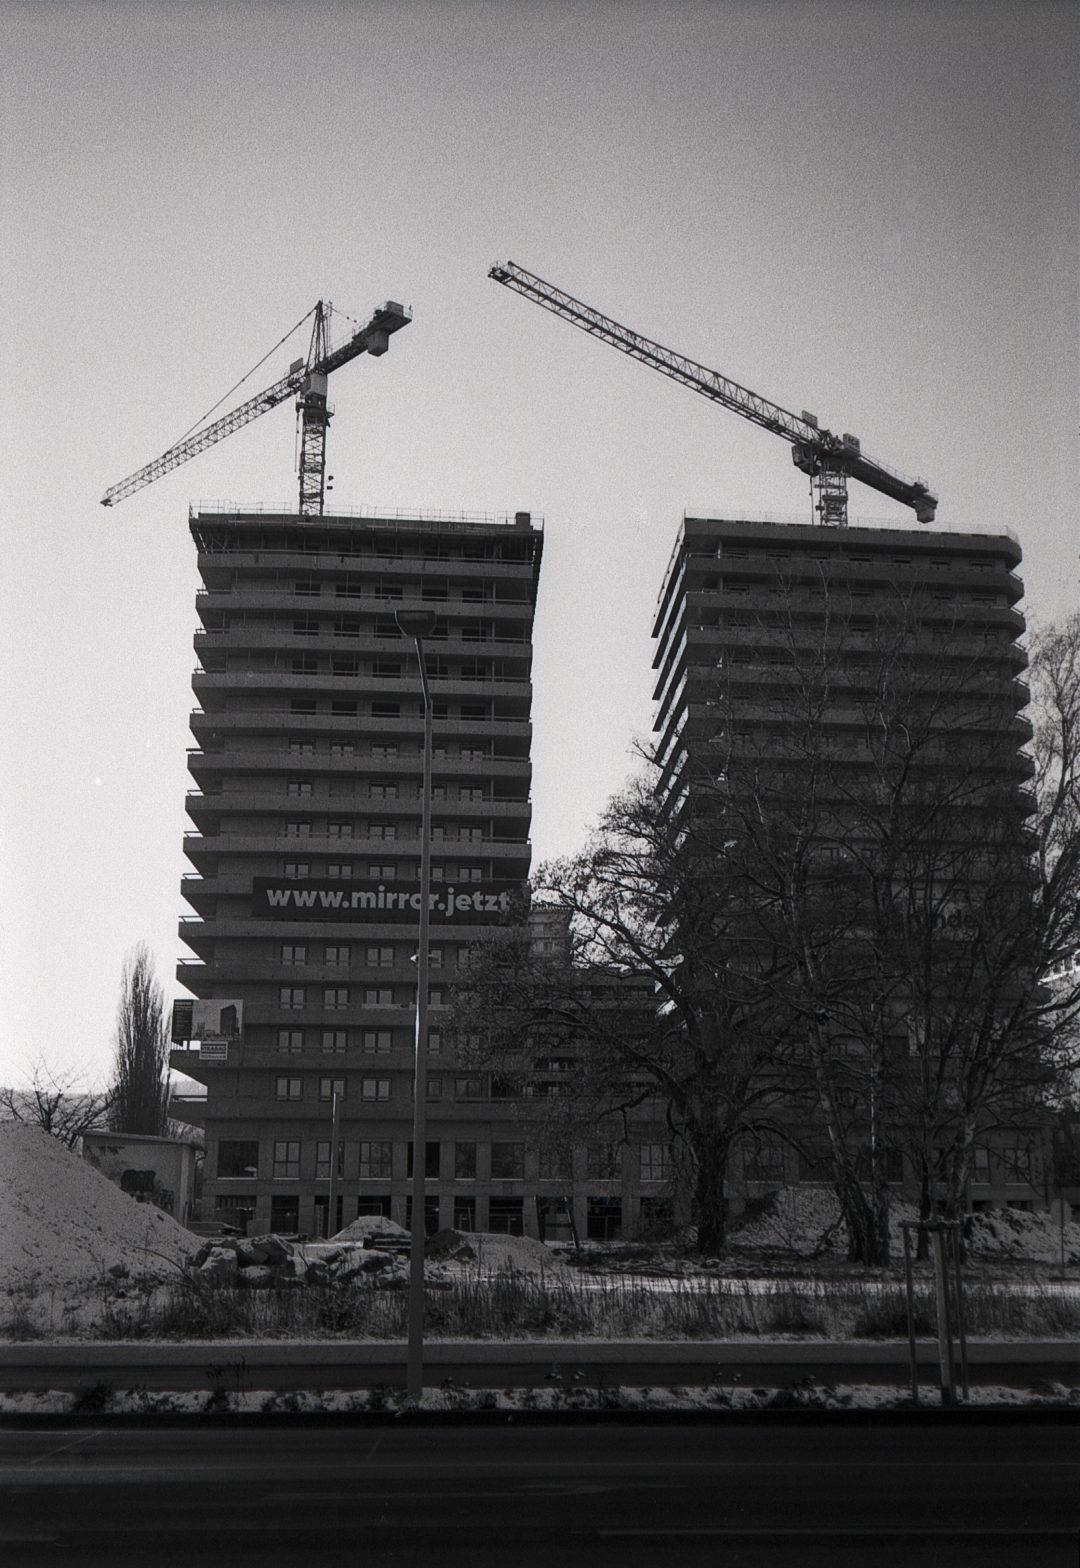 #018 Film per day – Reininghaus Mirror Building, Graz